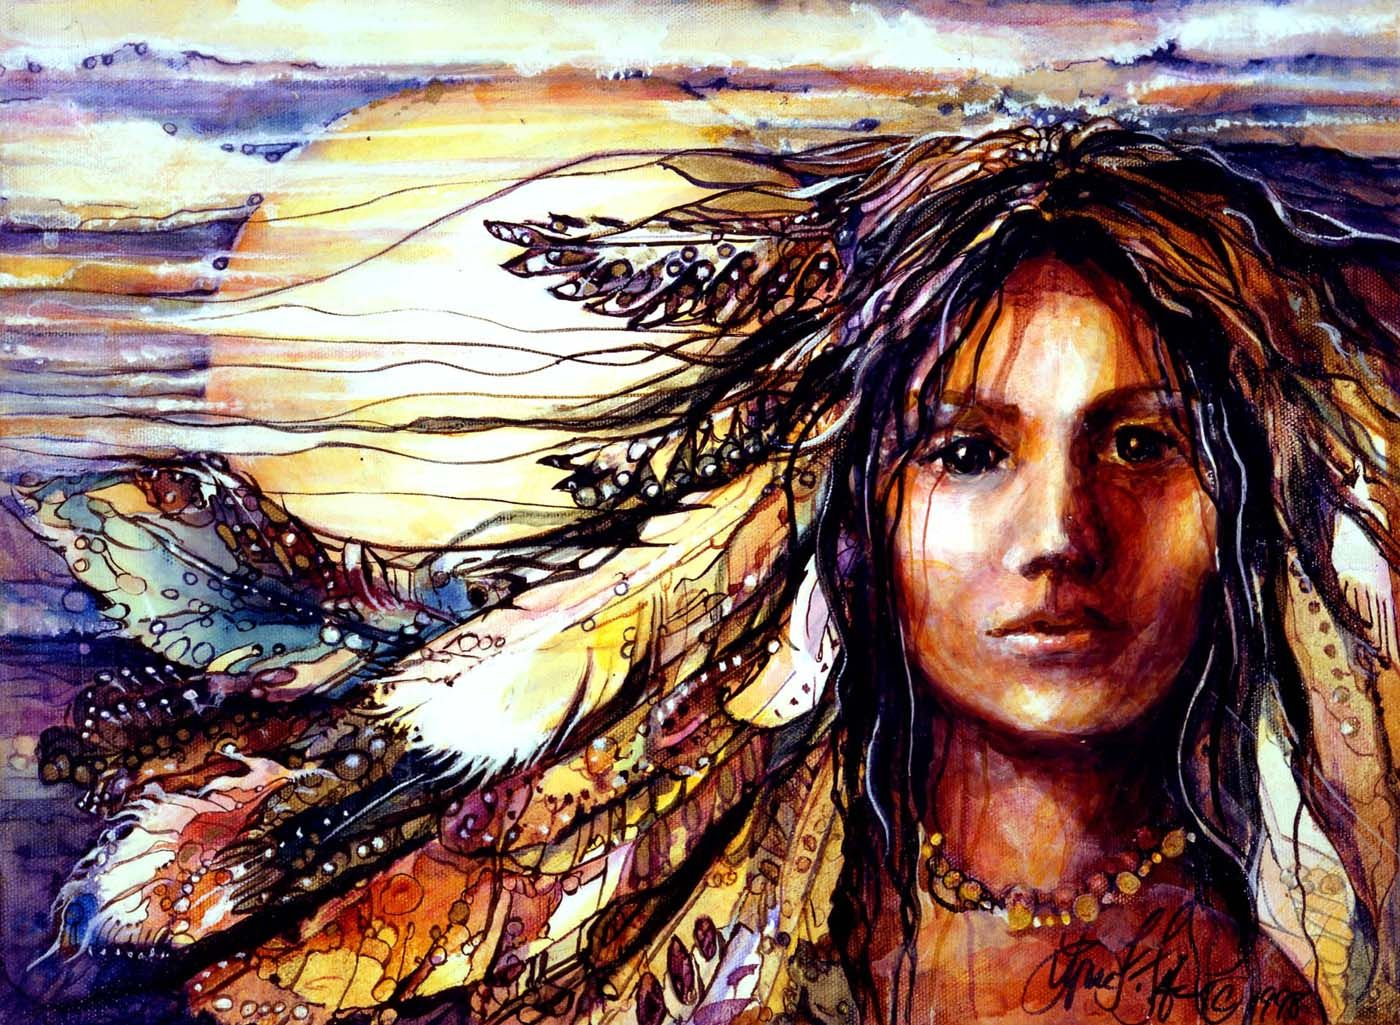 Native American Indian Women Golden Girl, abstract